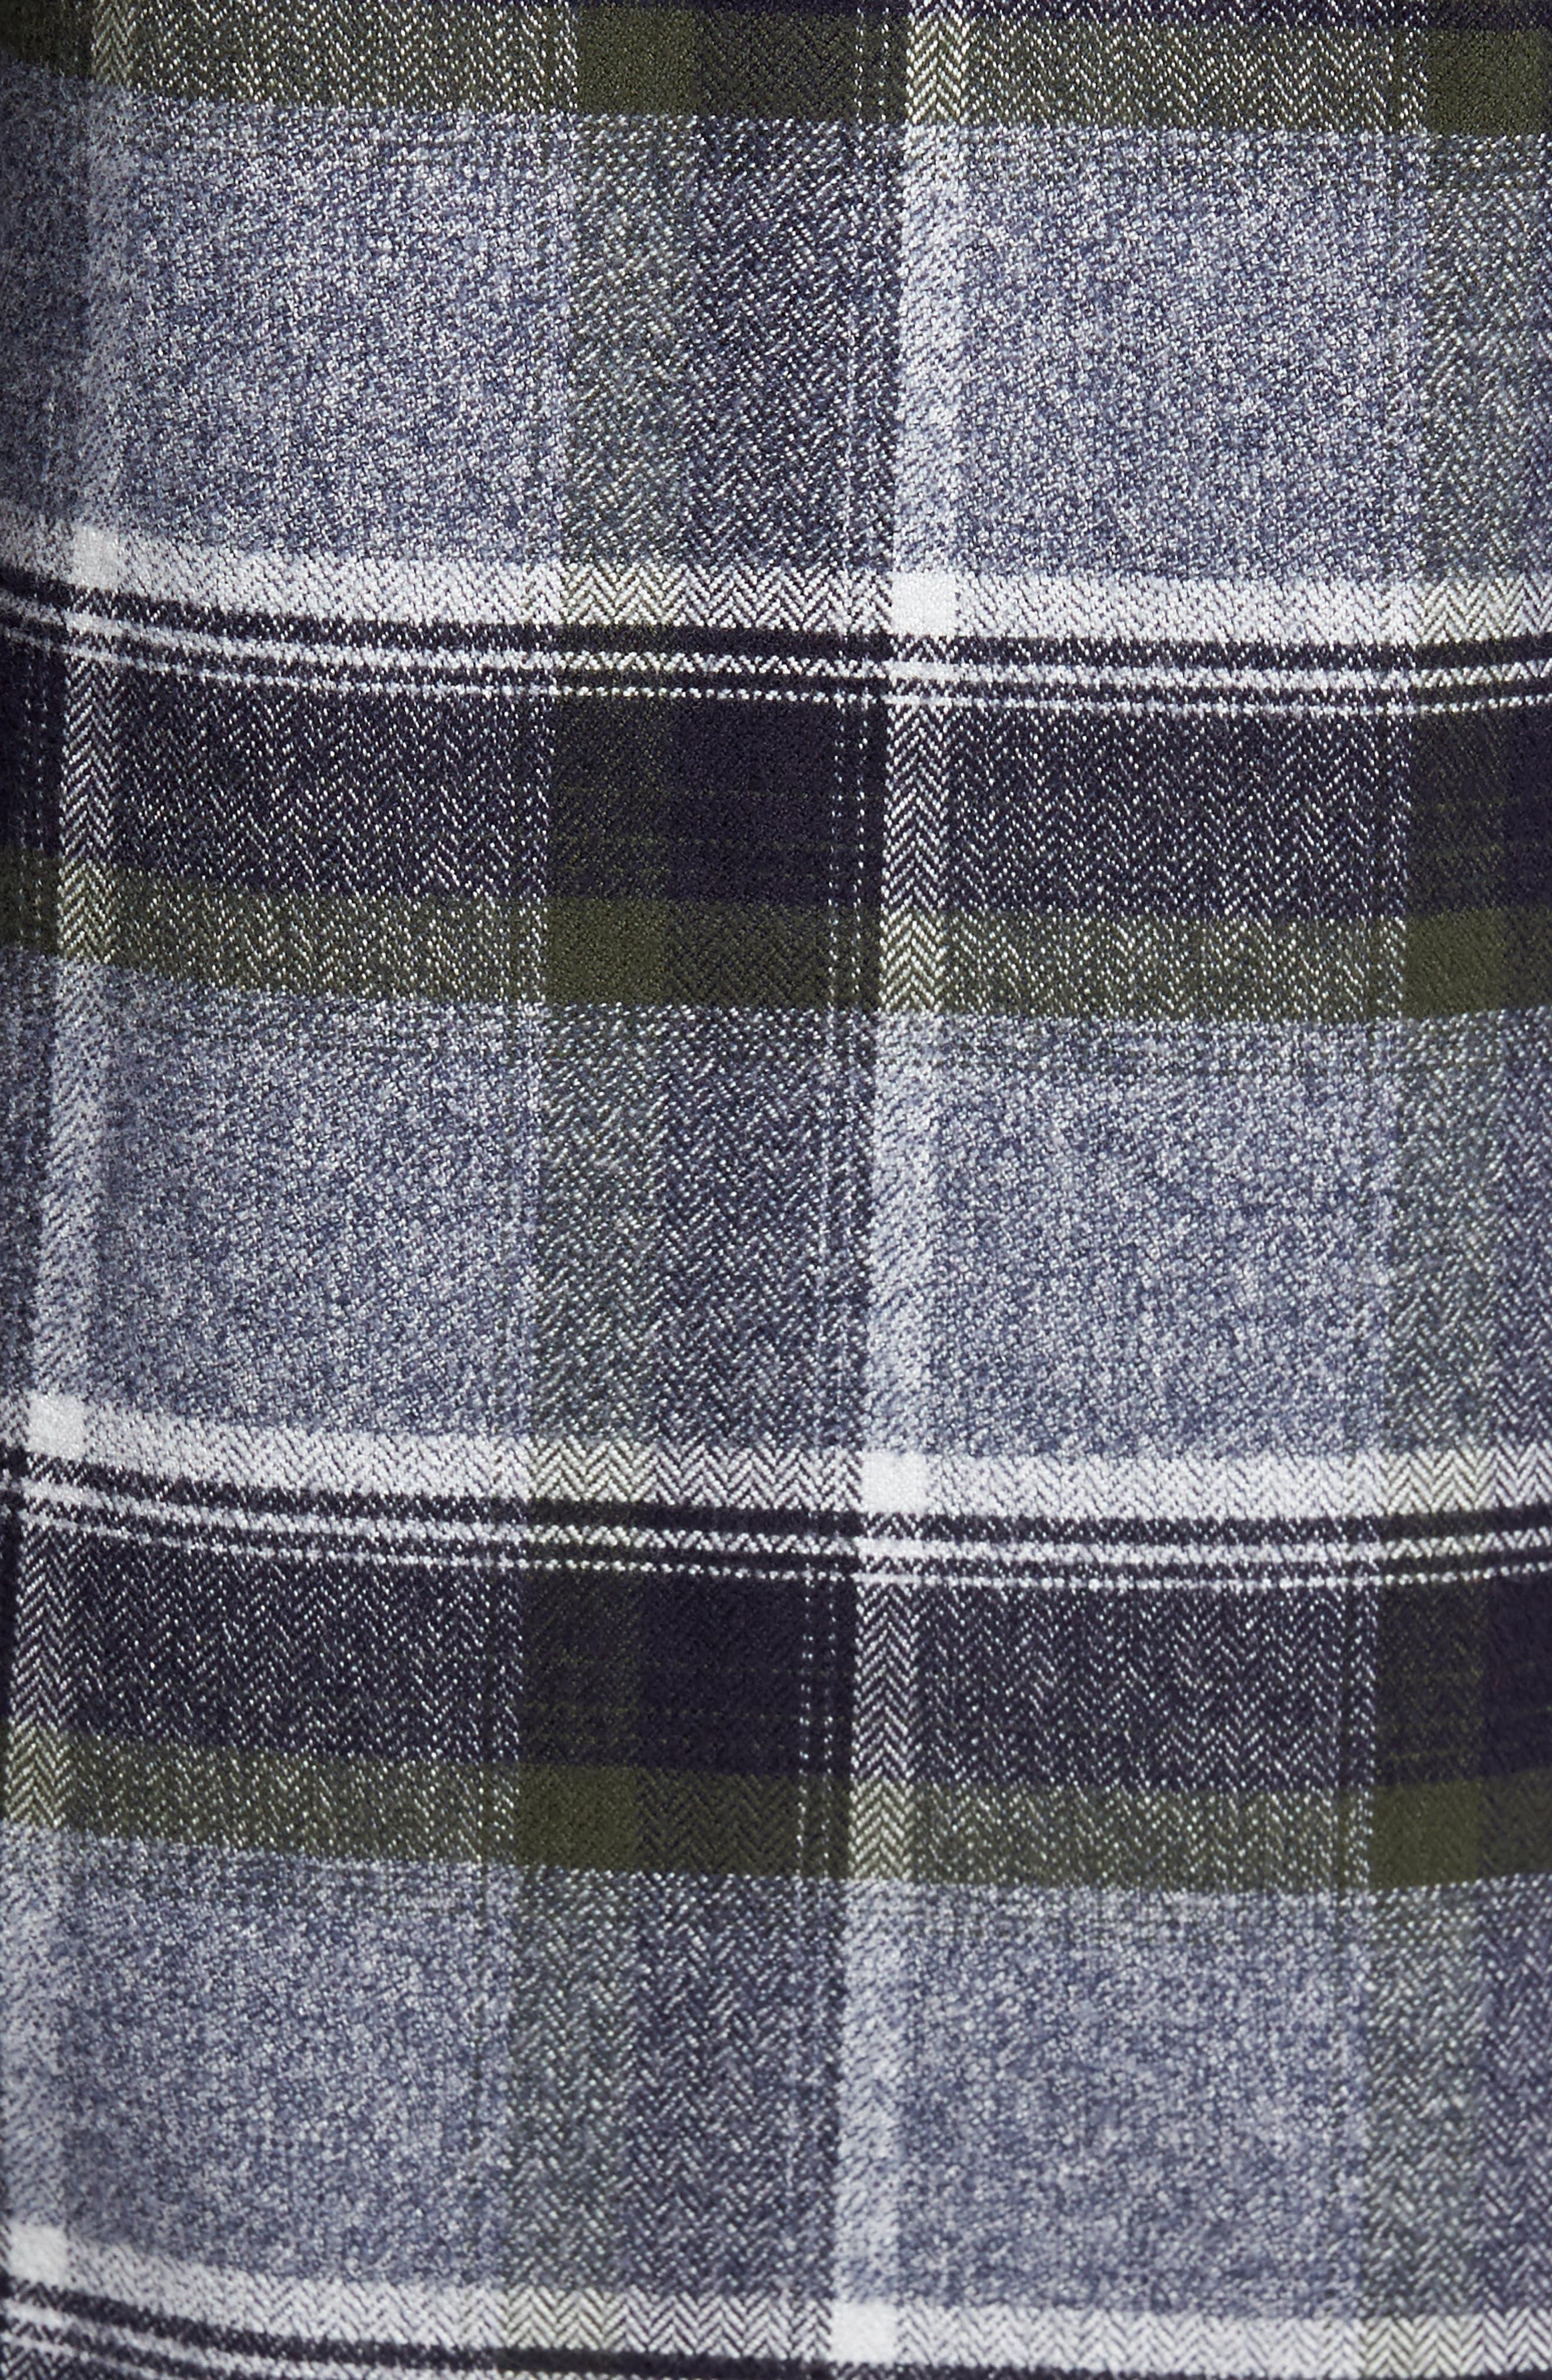 Regular Fit Plaid Flannel Shirt,                             Alternate thumbnail 5, color,